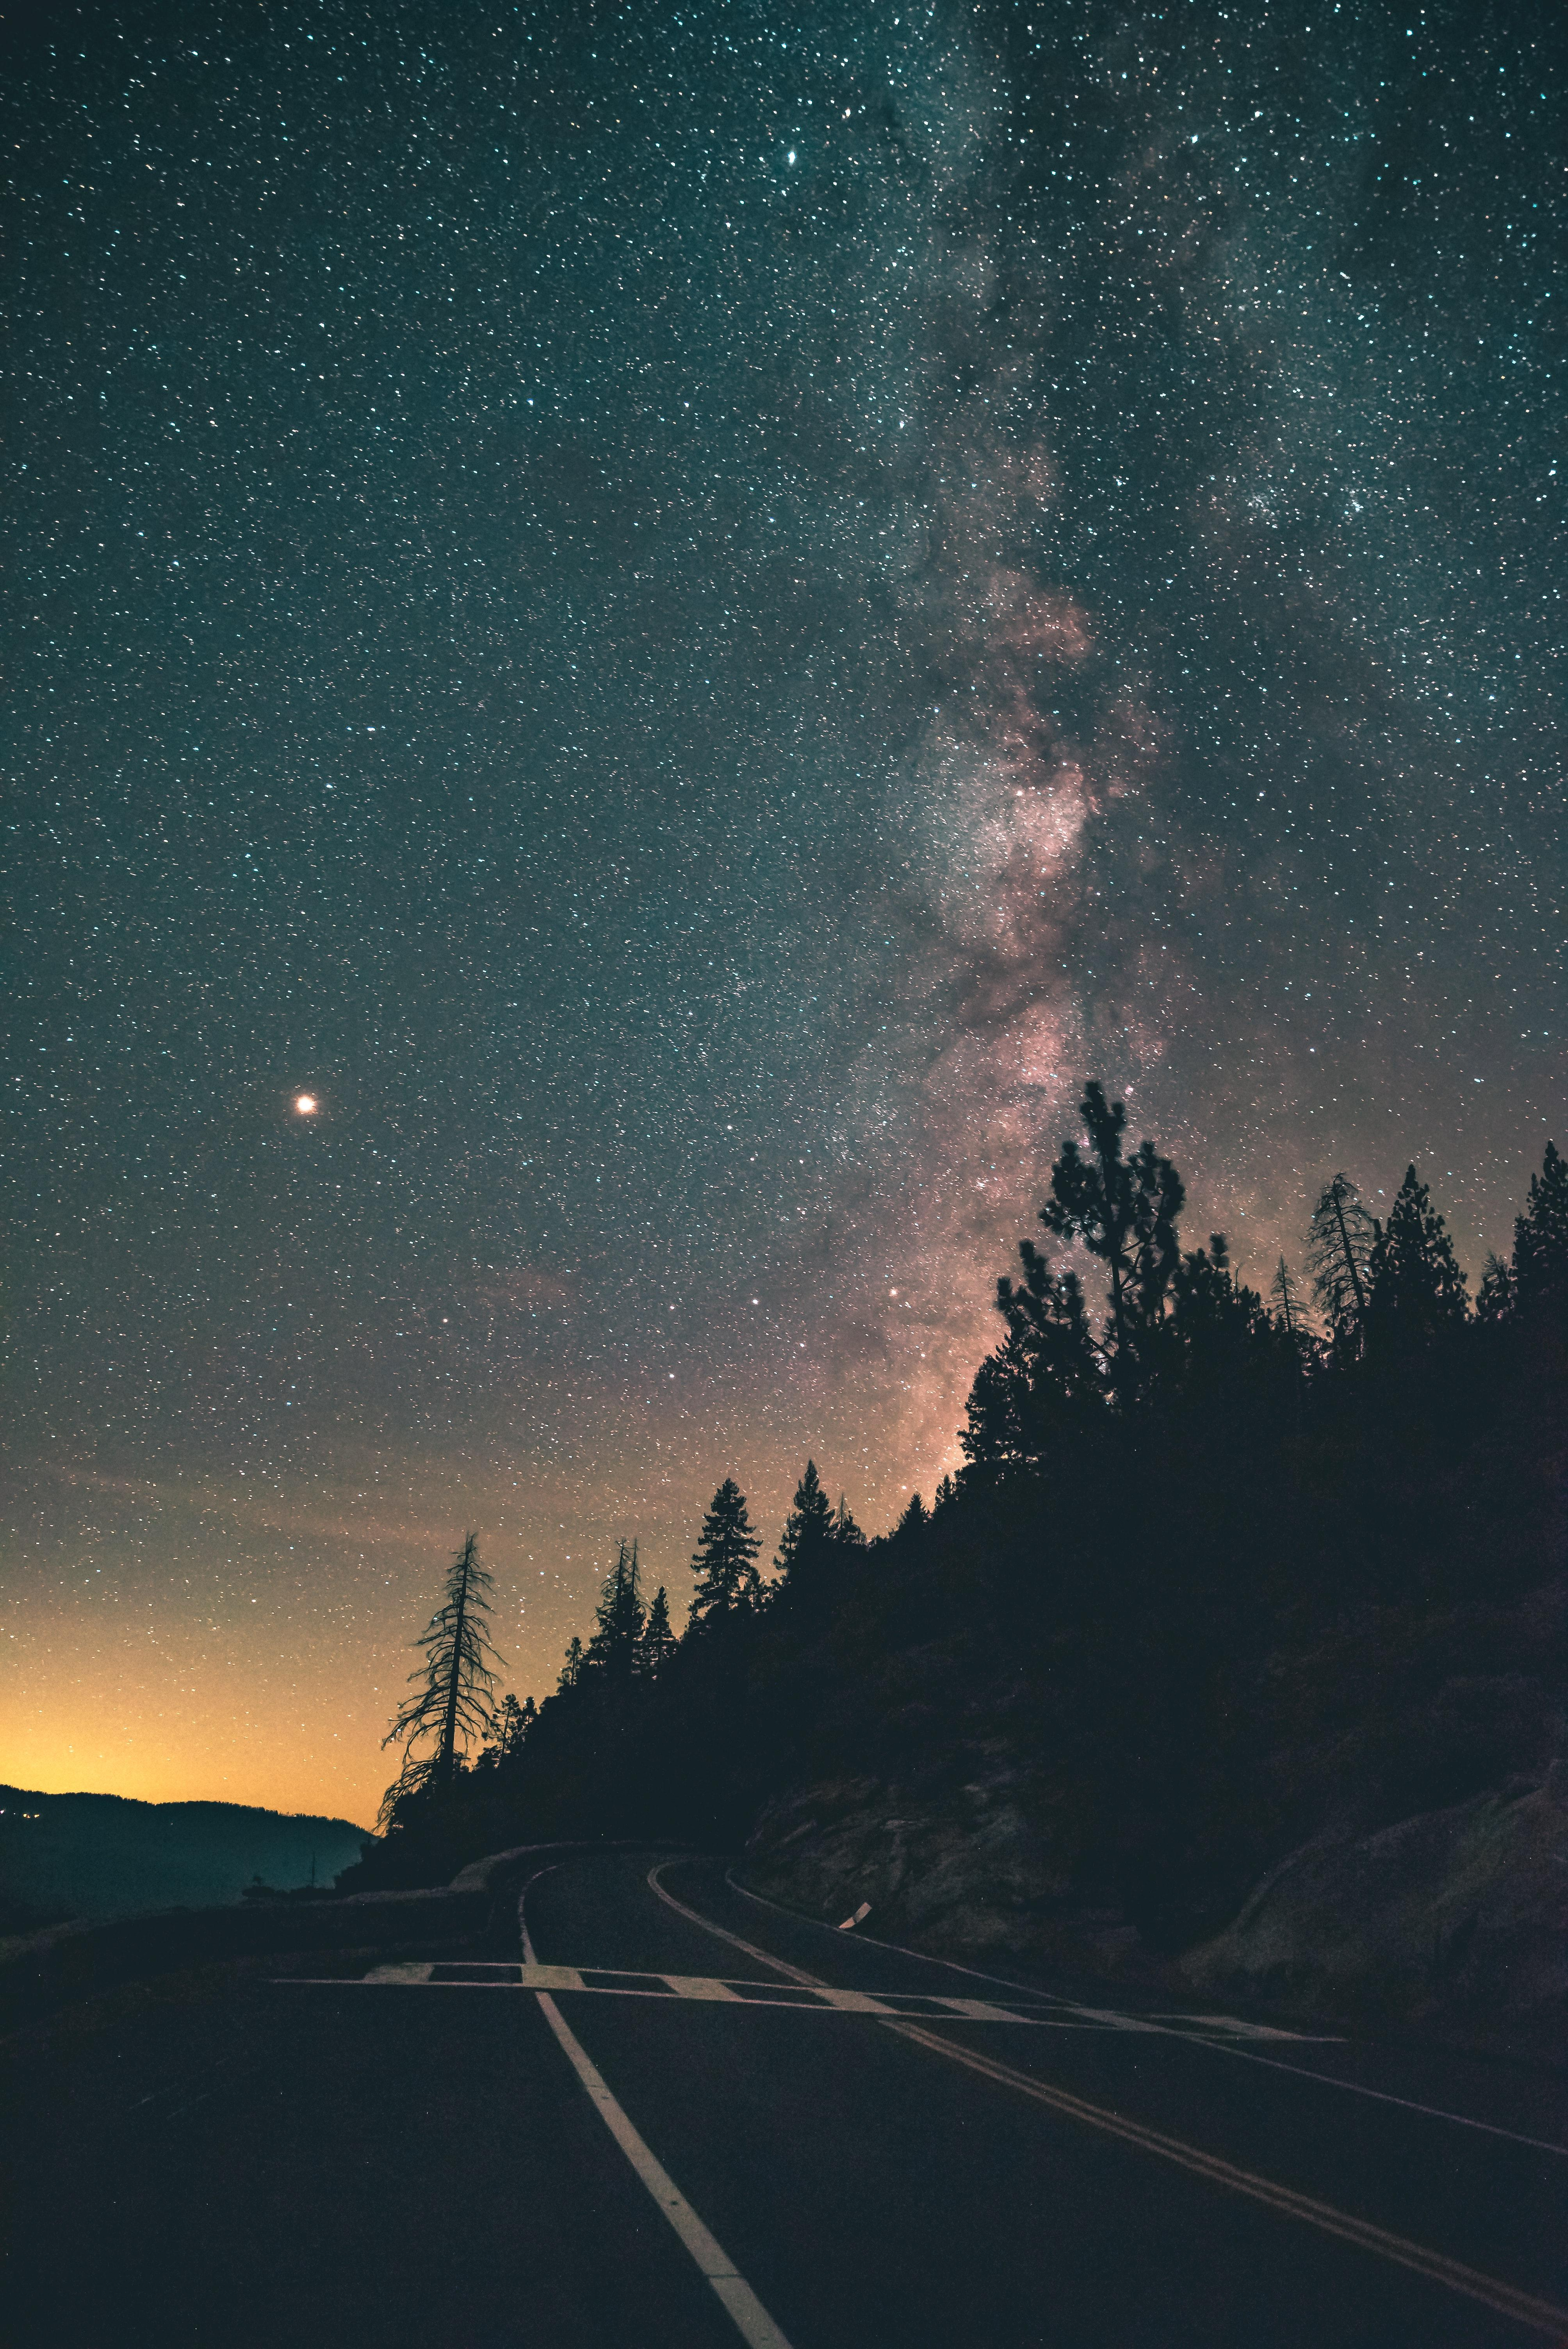 Download Night Sky Wallpaper Hd Backgrounds Download Itlcat